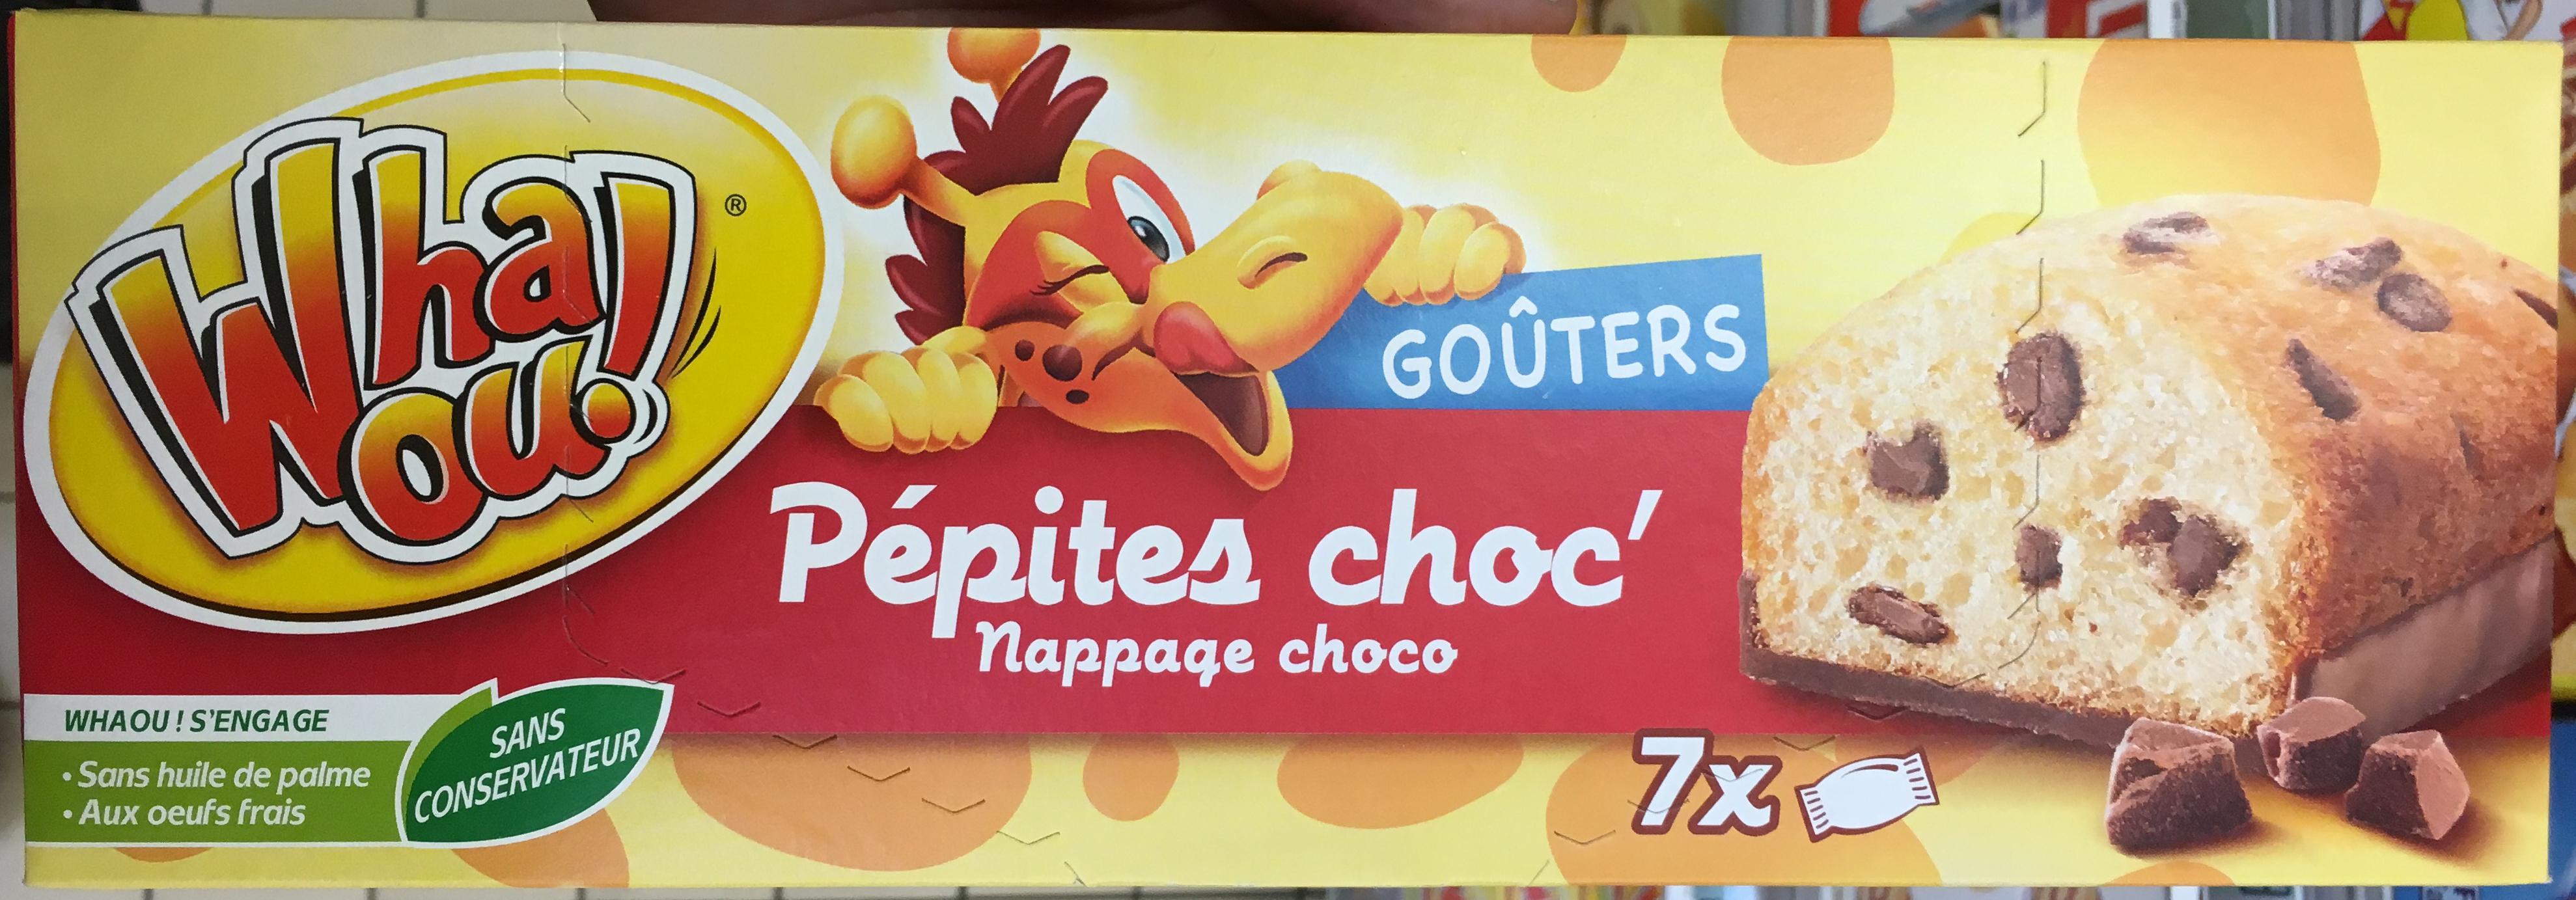 Pépites Choc' Nappage Choco - Product